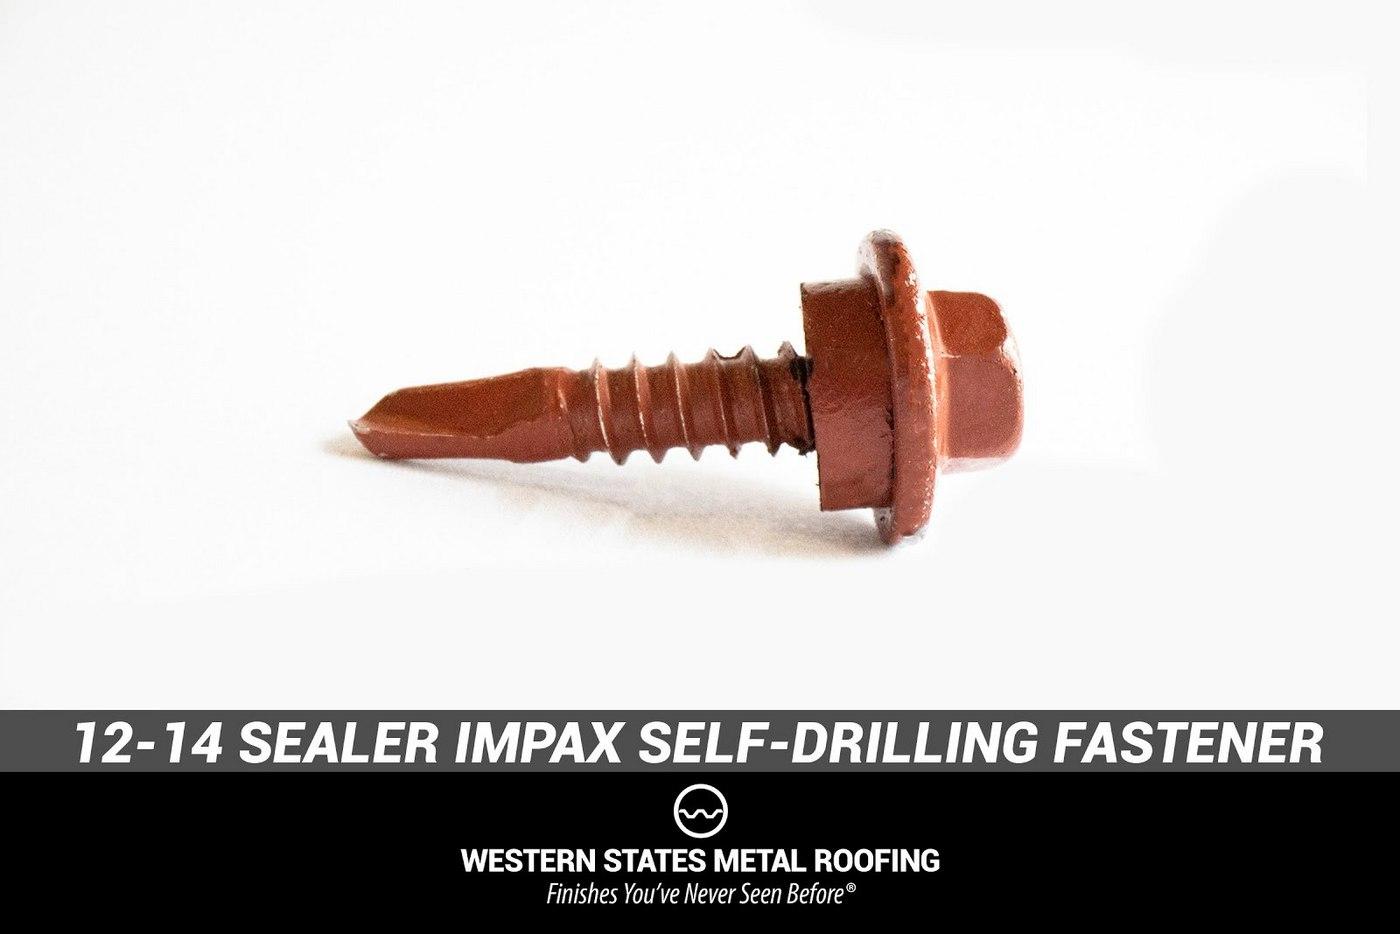 12-14 Sealer Impax Self-Drilling Fastener